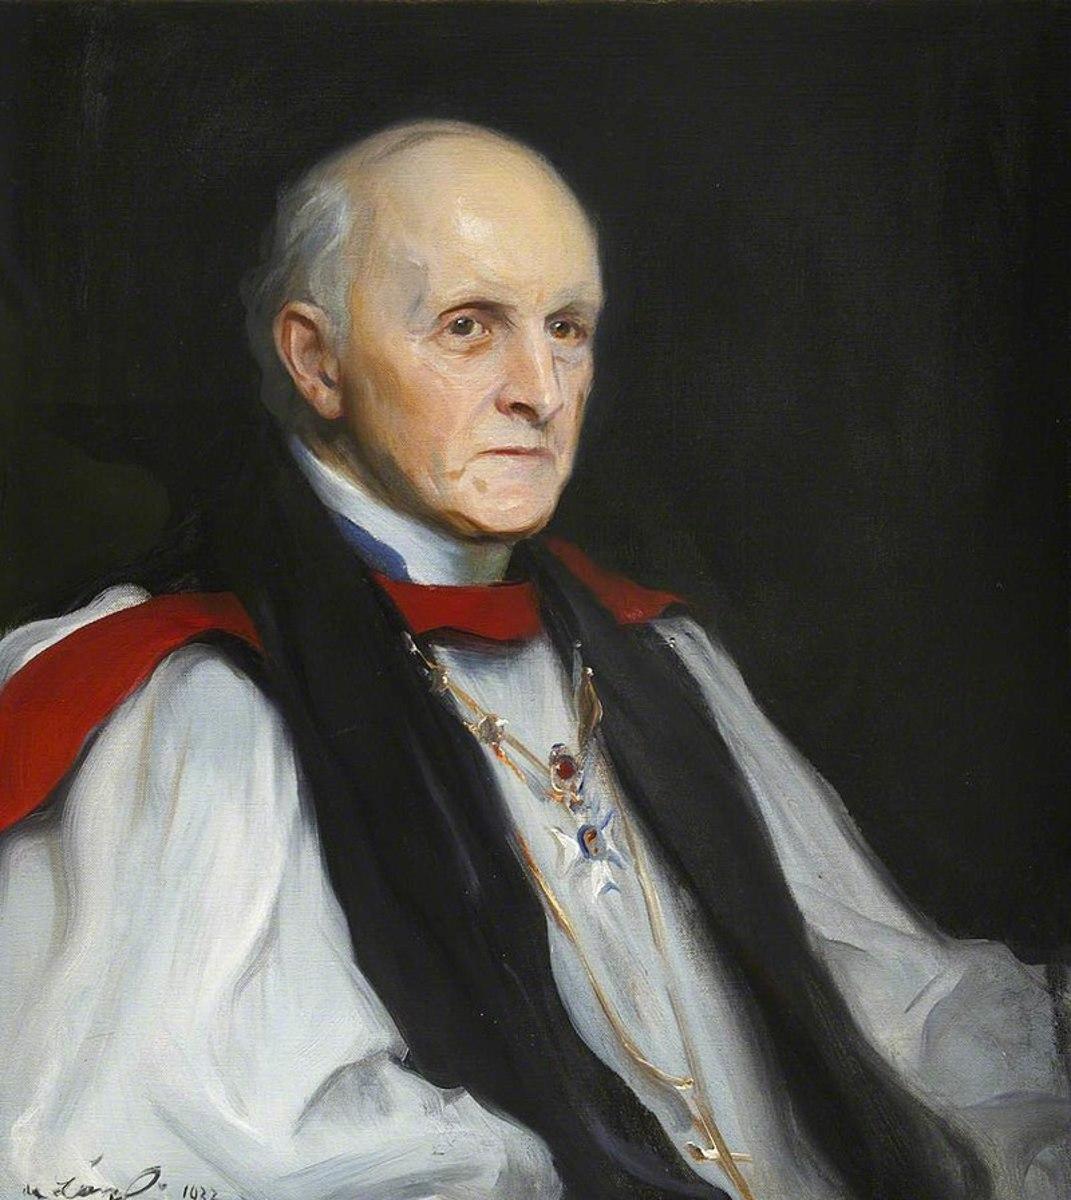 Philip de László's portrait of the Archbishop of Canterbury Cosmo Gordon Lang.